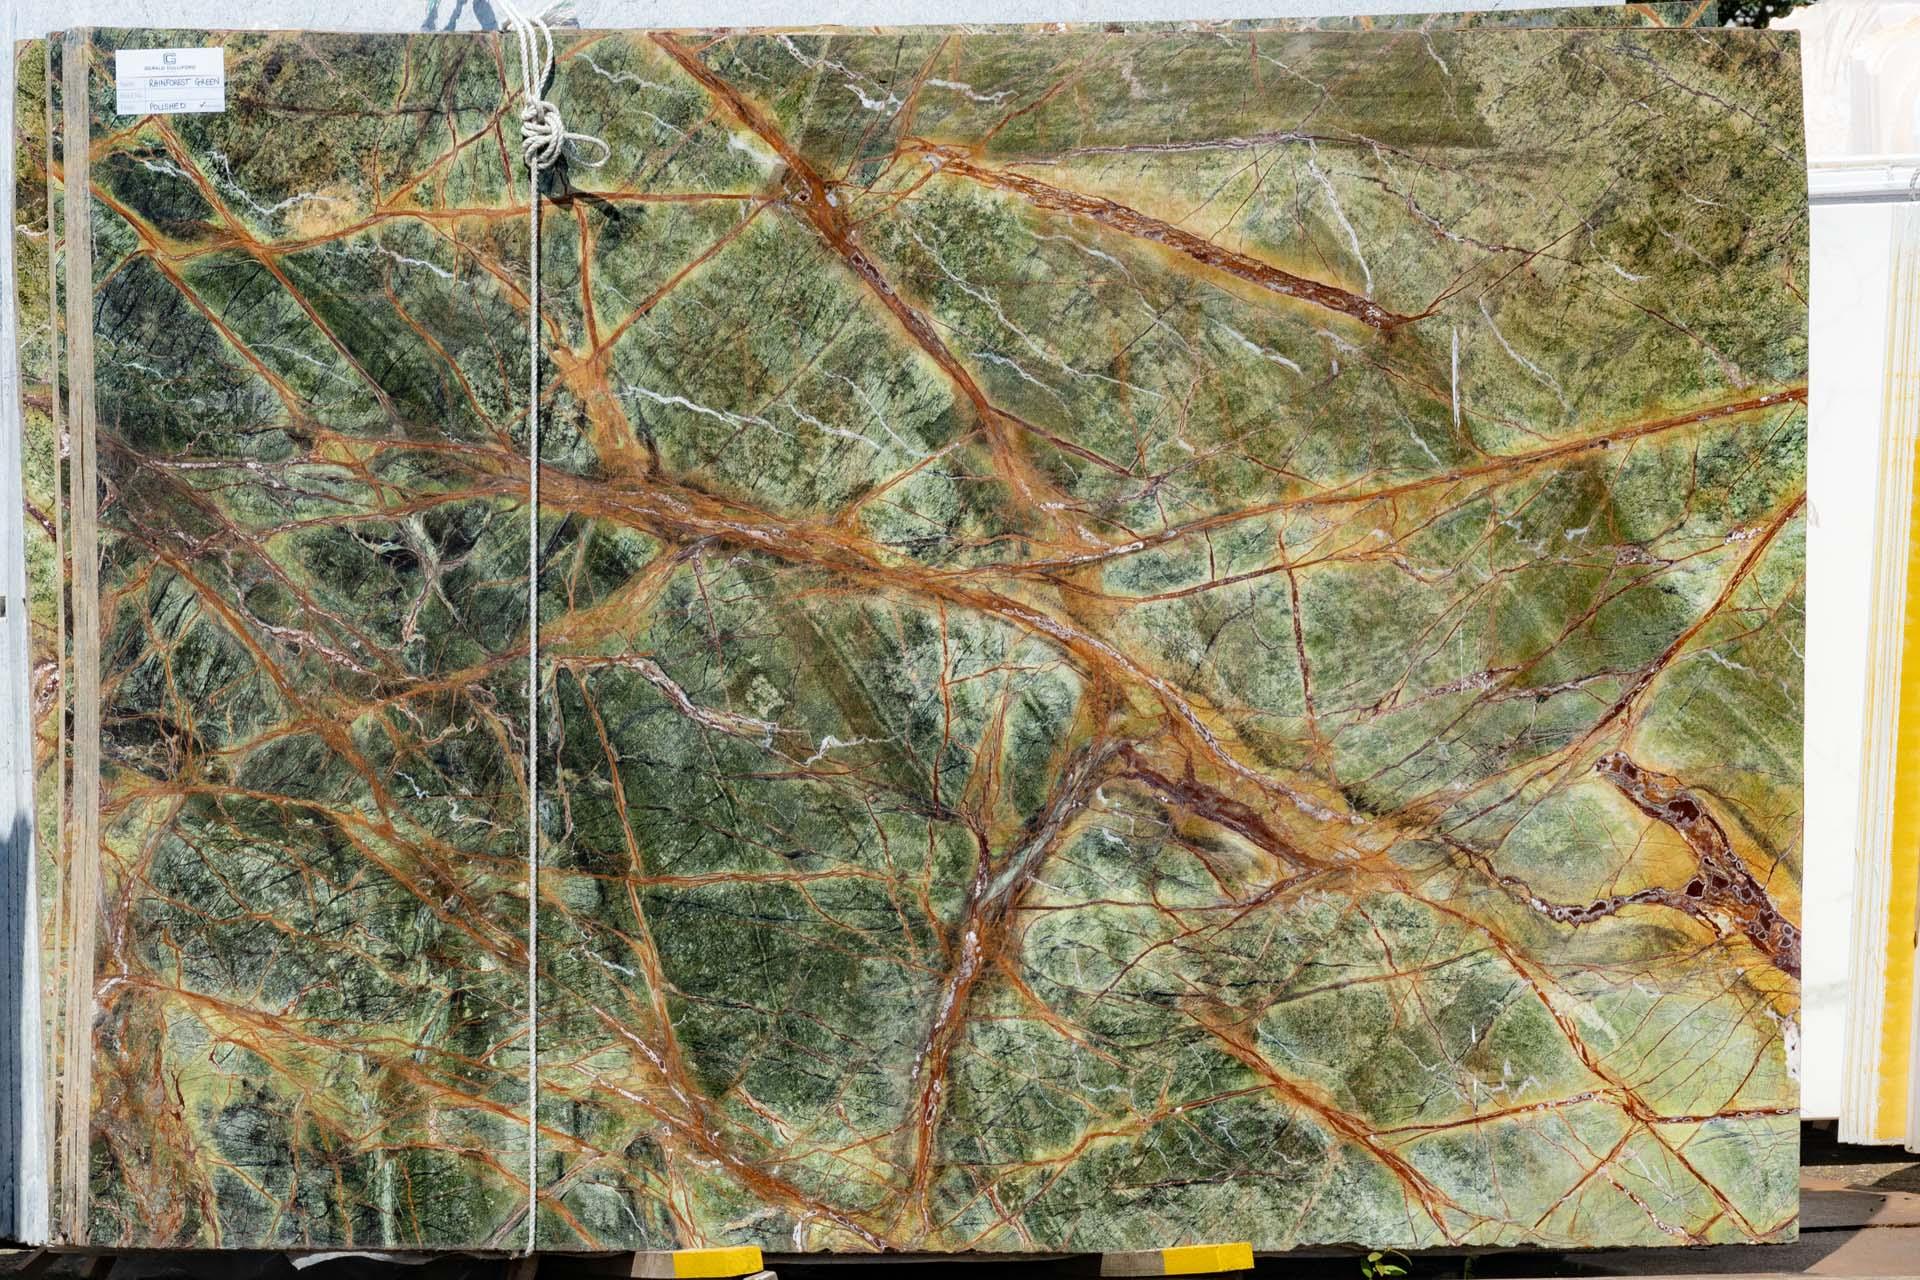 culliford-open-day-granite-worktops-radianz-lundhs-180622-103020-a